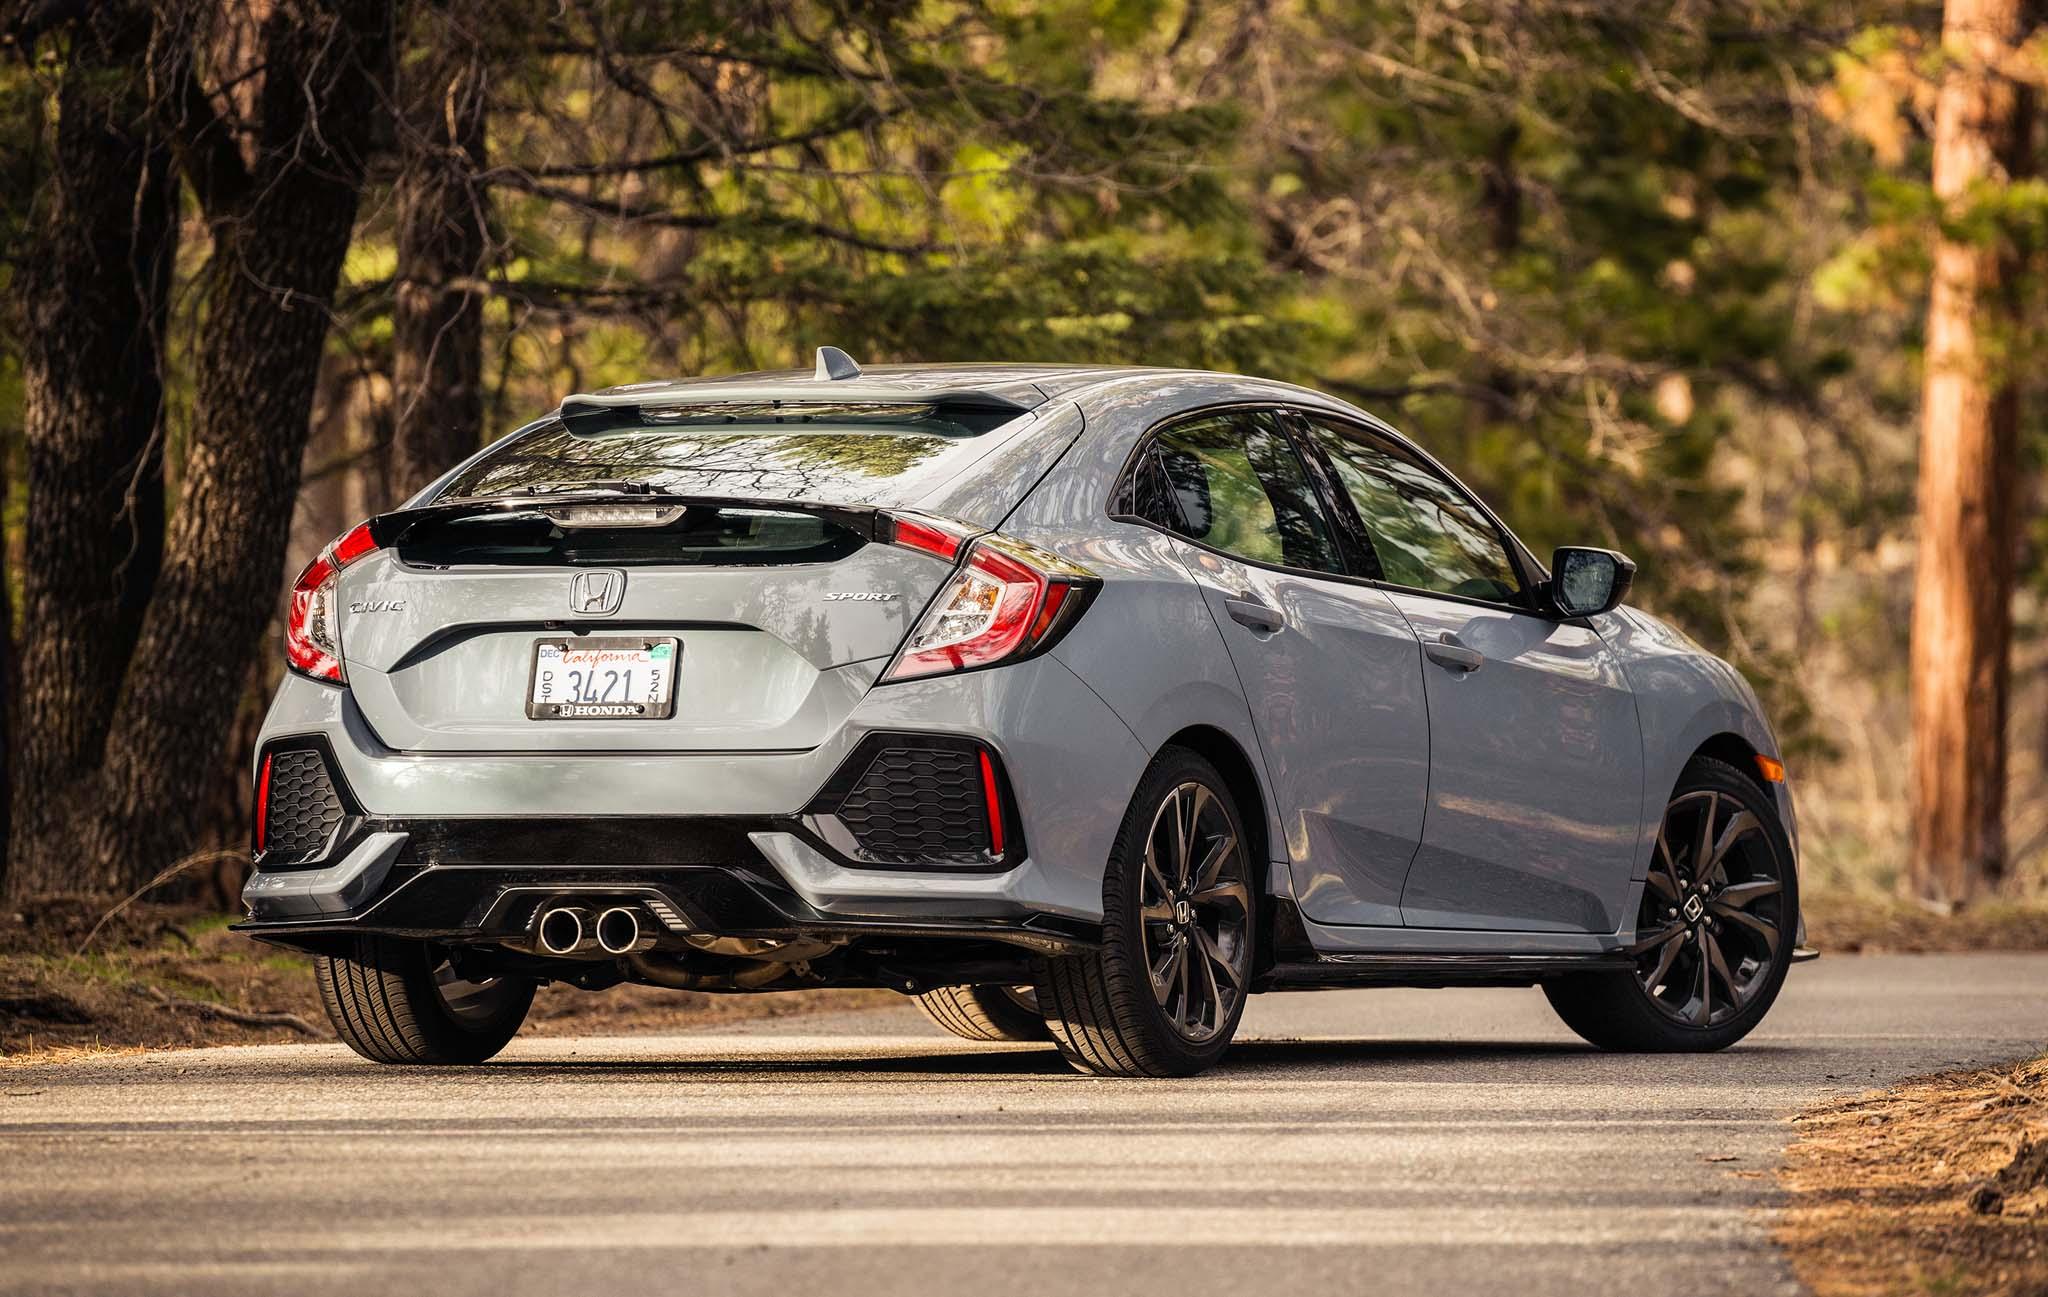 2017 Honda Civic Hatchback Sport rear three quarter